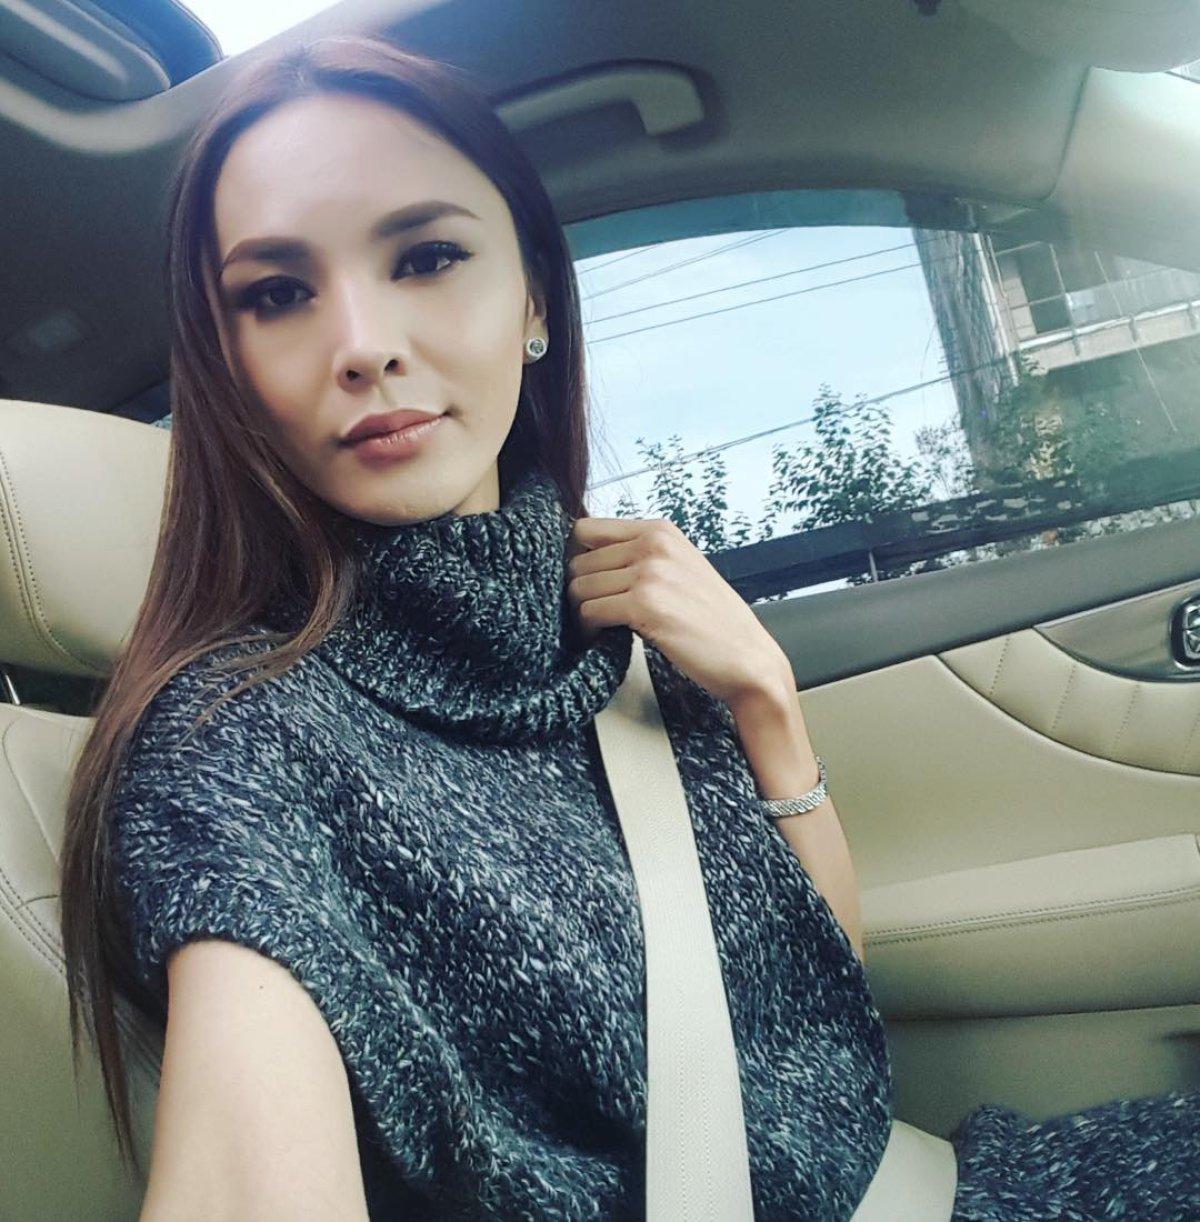 La mentira sobre 'Miss Mongolia' que todo el mundo se creyó